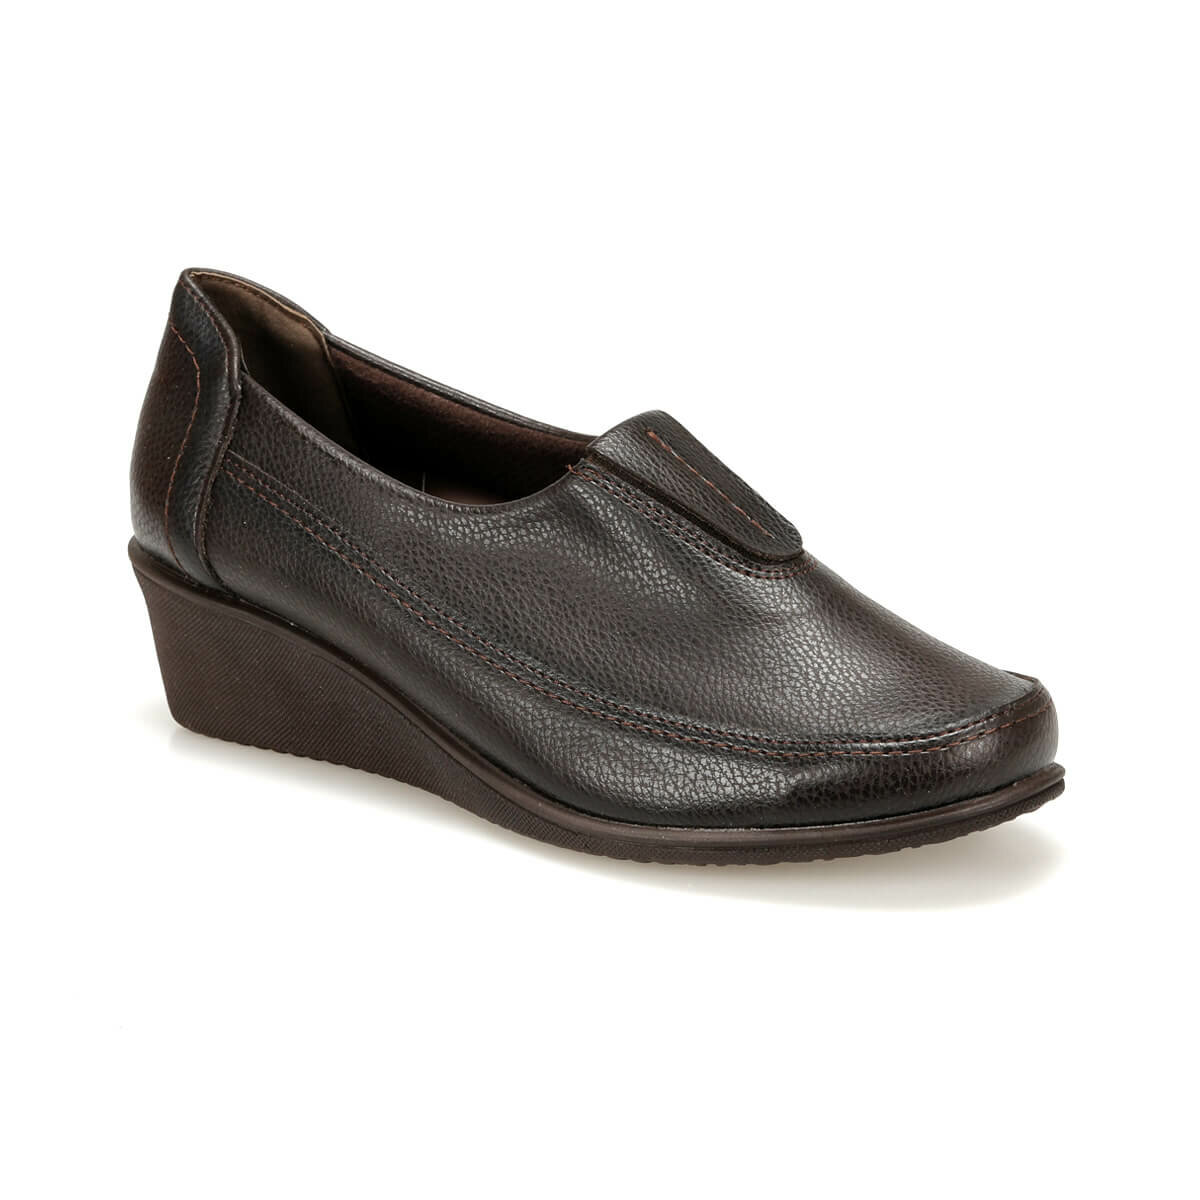 FLO 72. 109102.Z Brown Women 'S Shoes Polaris 5 Point